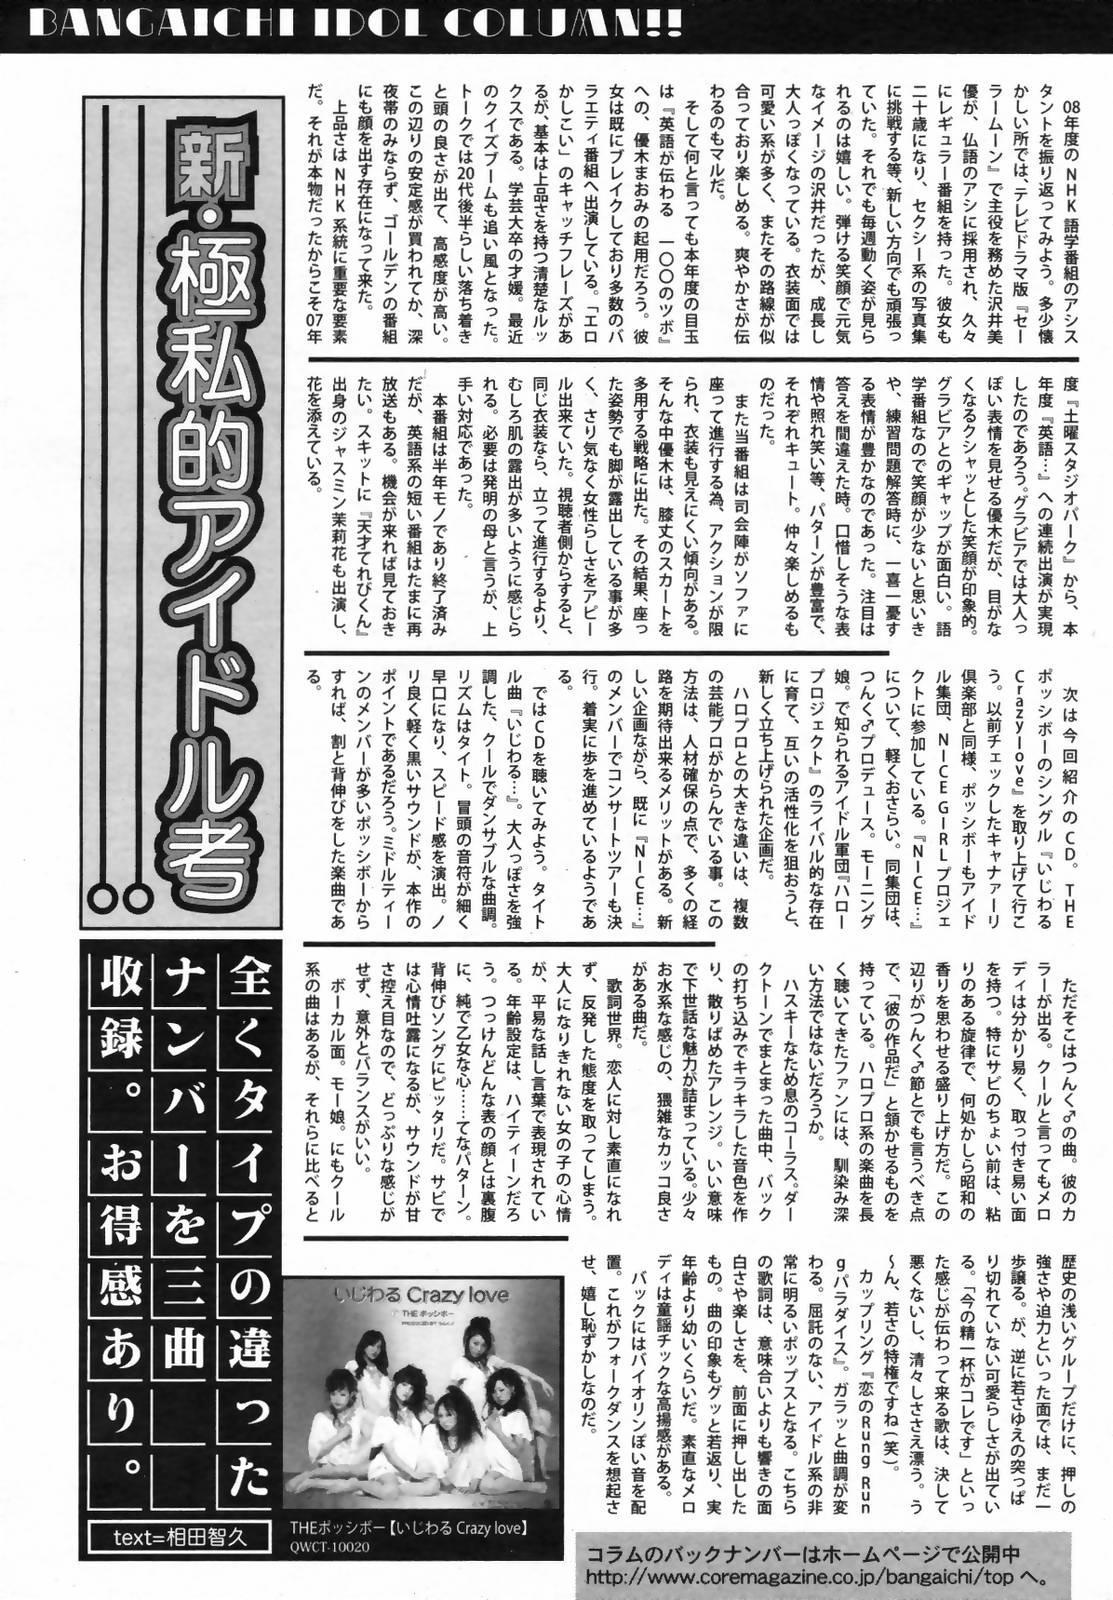 Manga Bangaichi 2009-02 Vol. 234 248